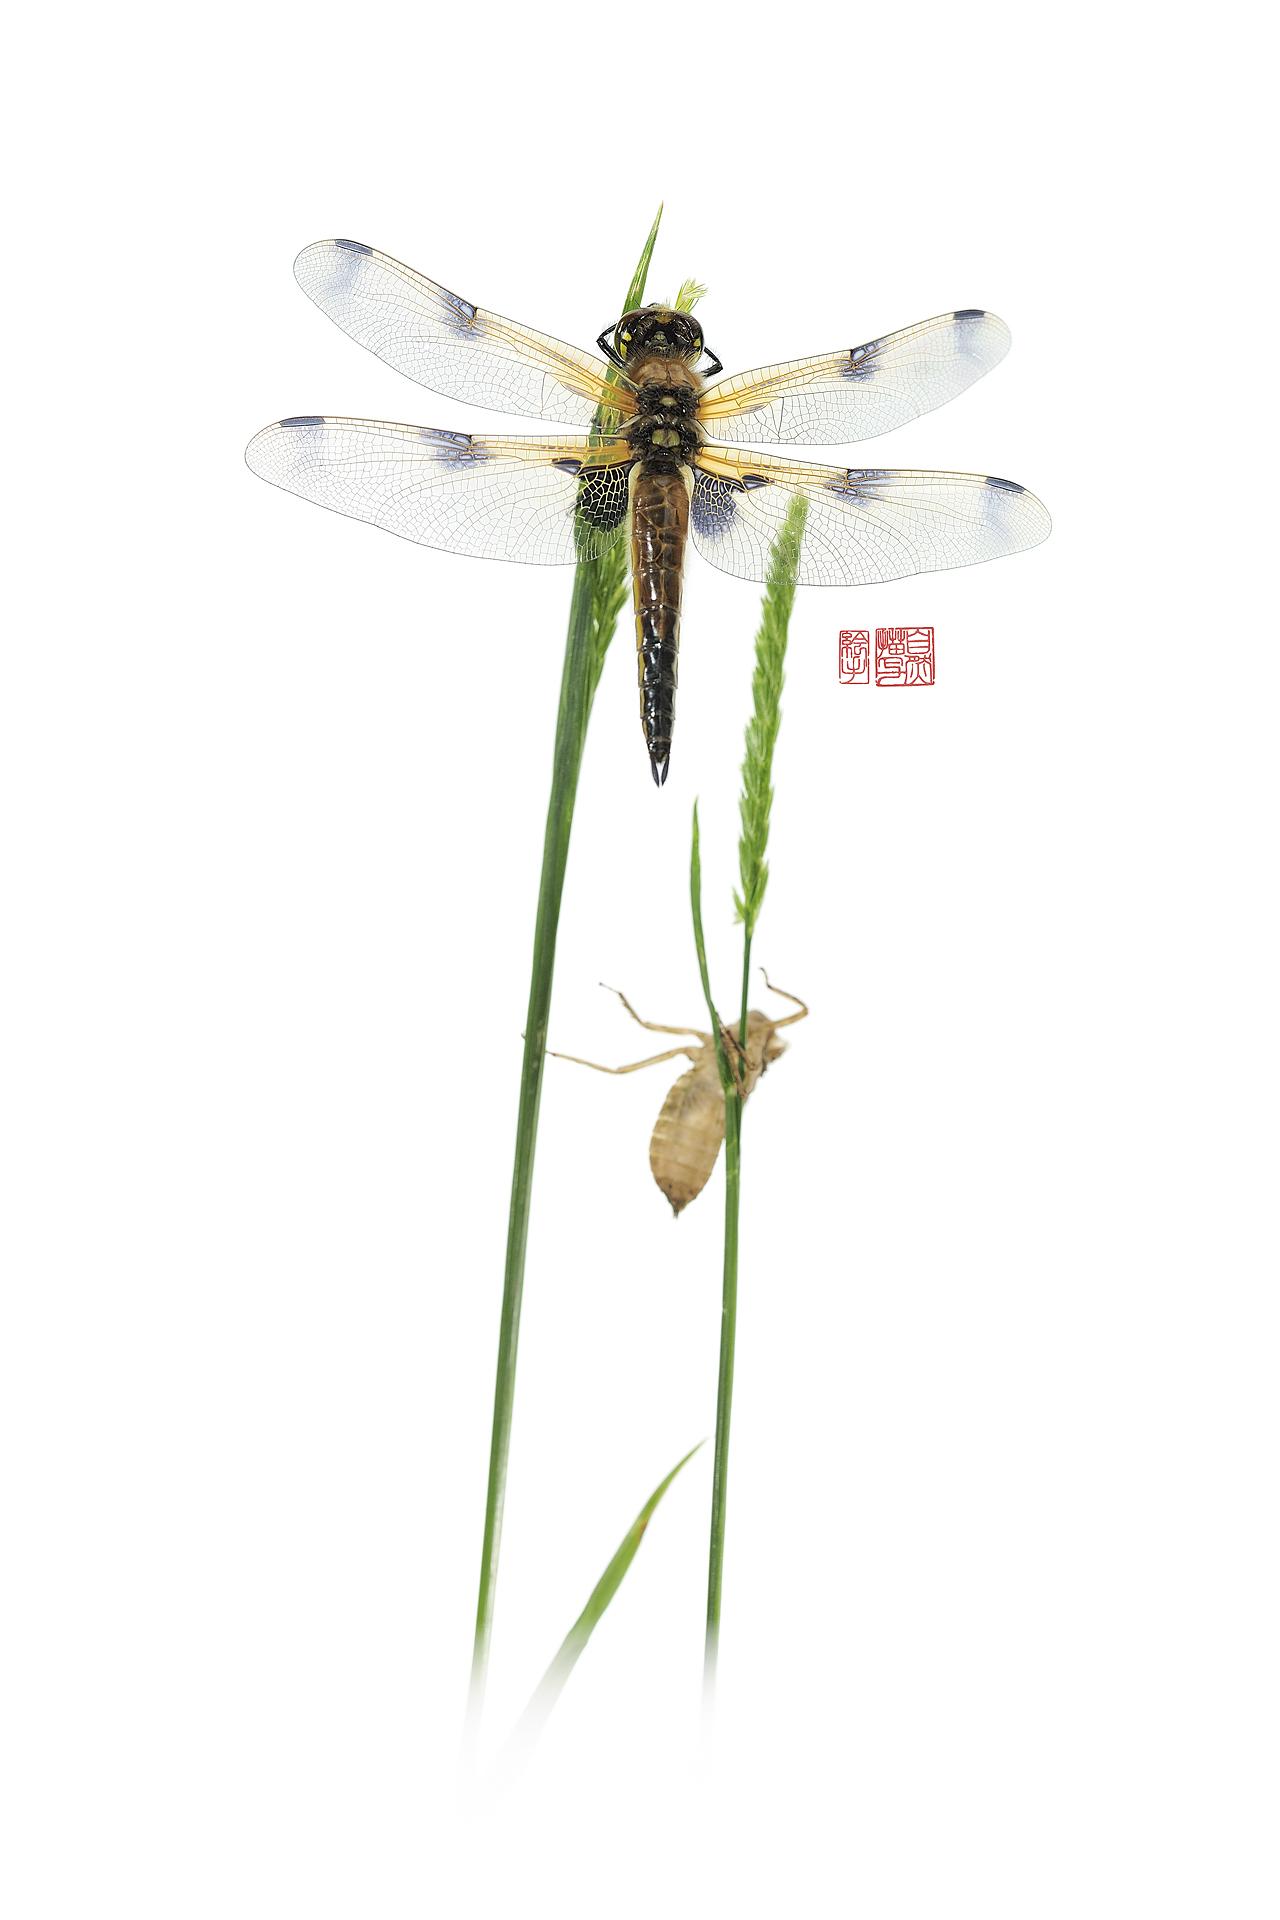 Libellula quadrimaculata suisaienogu Nikon